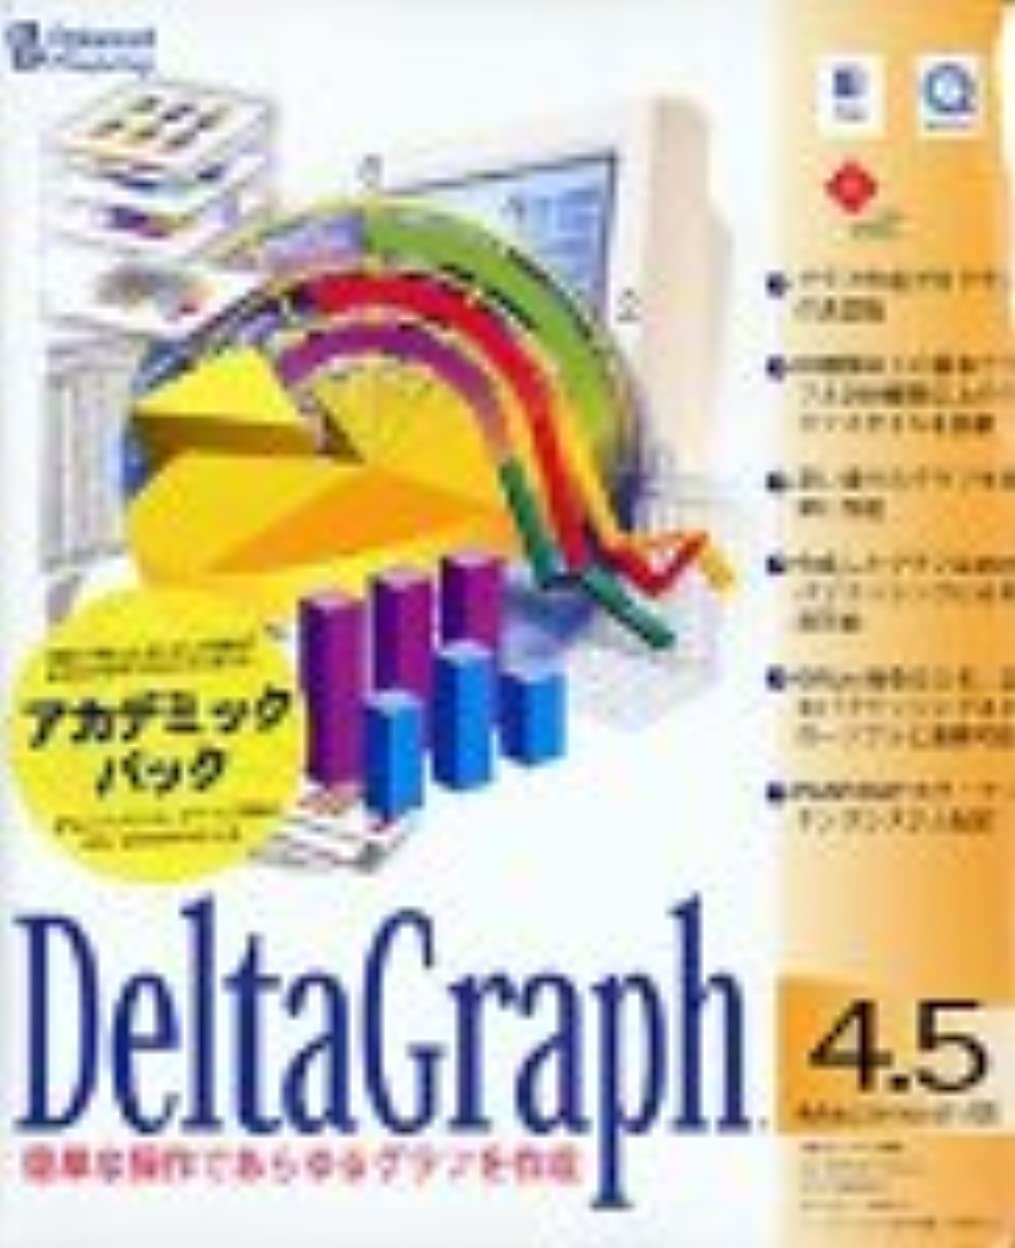 DeltaGraph 4.5 Macintosh 解説本 バンドル版 アカデミックパック